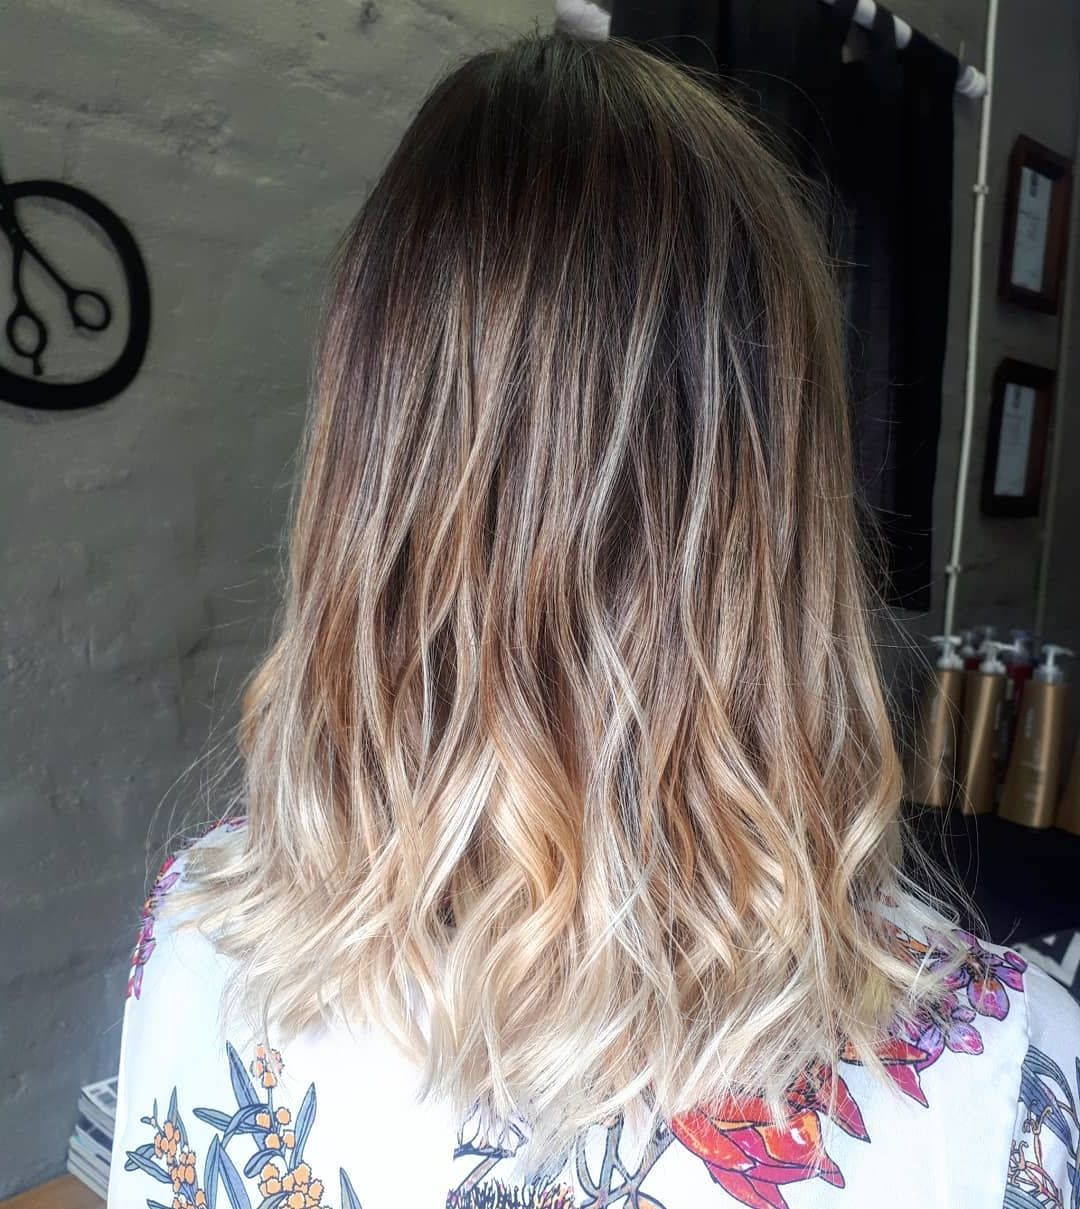 25 Ash Blonde Balayage Hair Color Ideas #lightashblonde